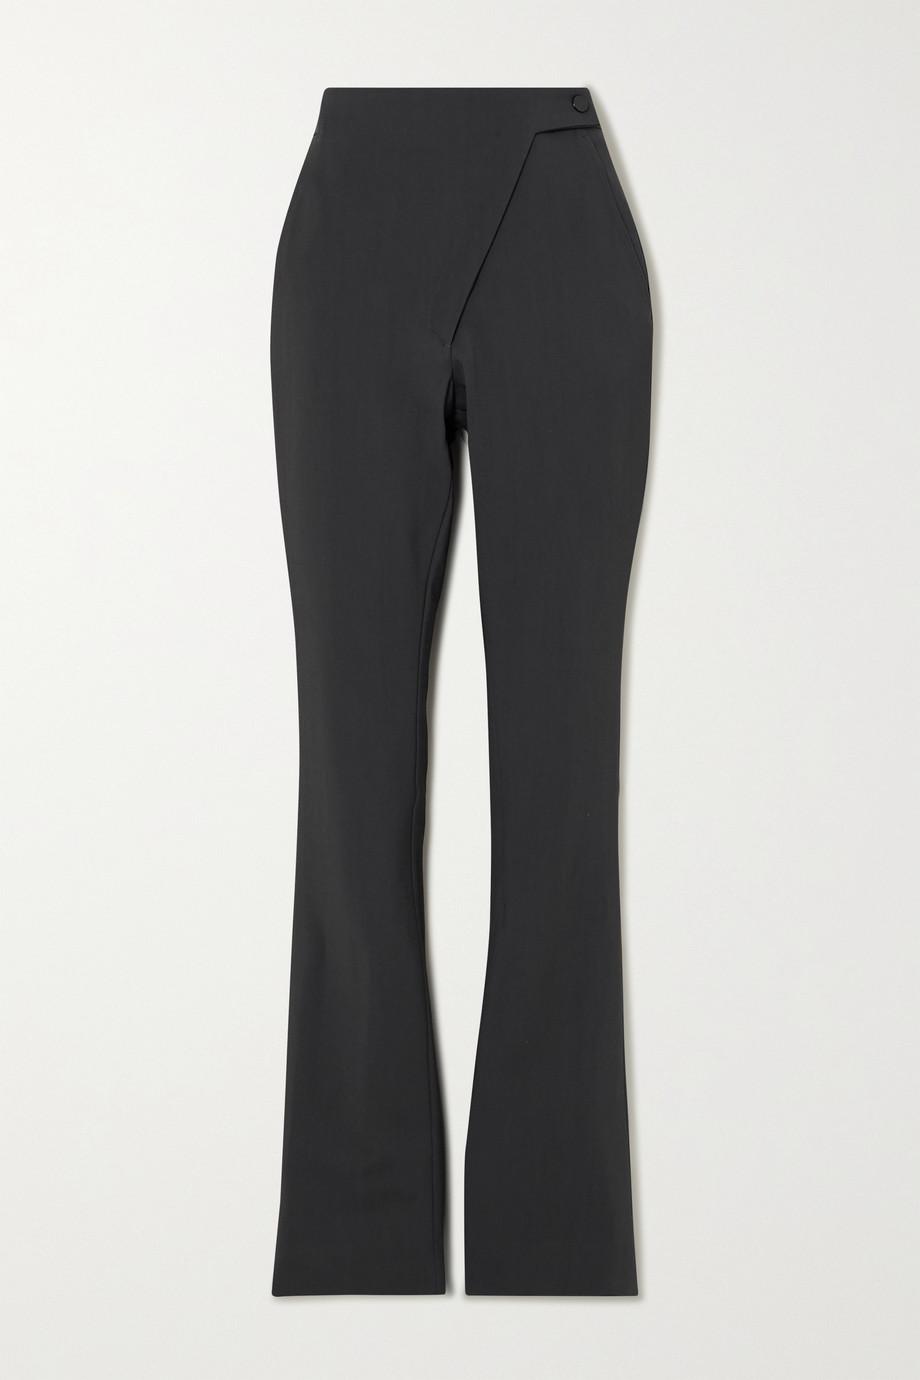 Coperni Woven flared pants